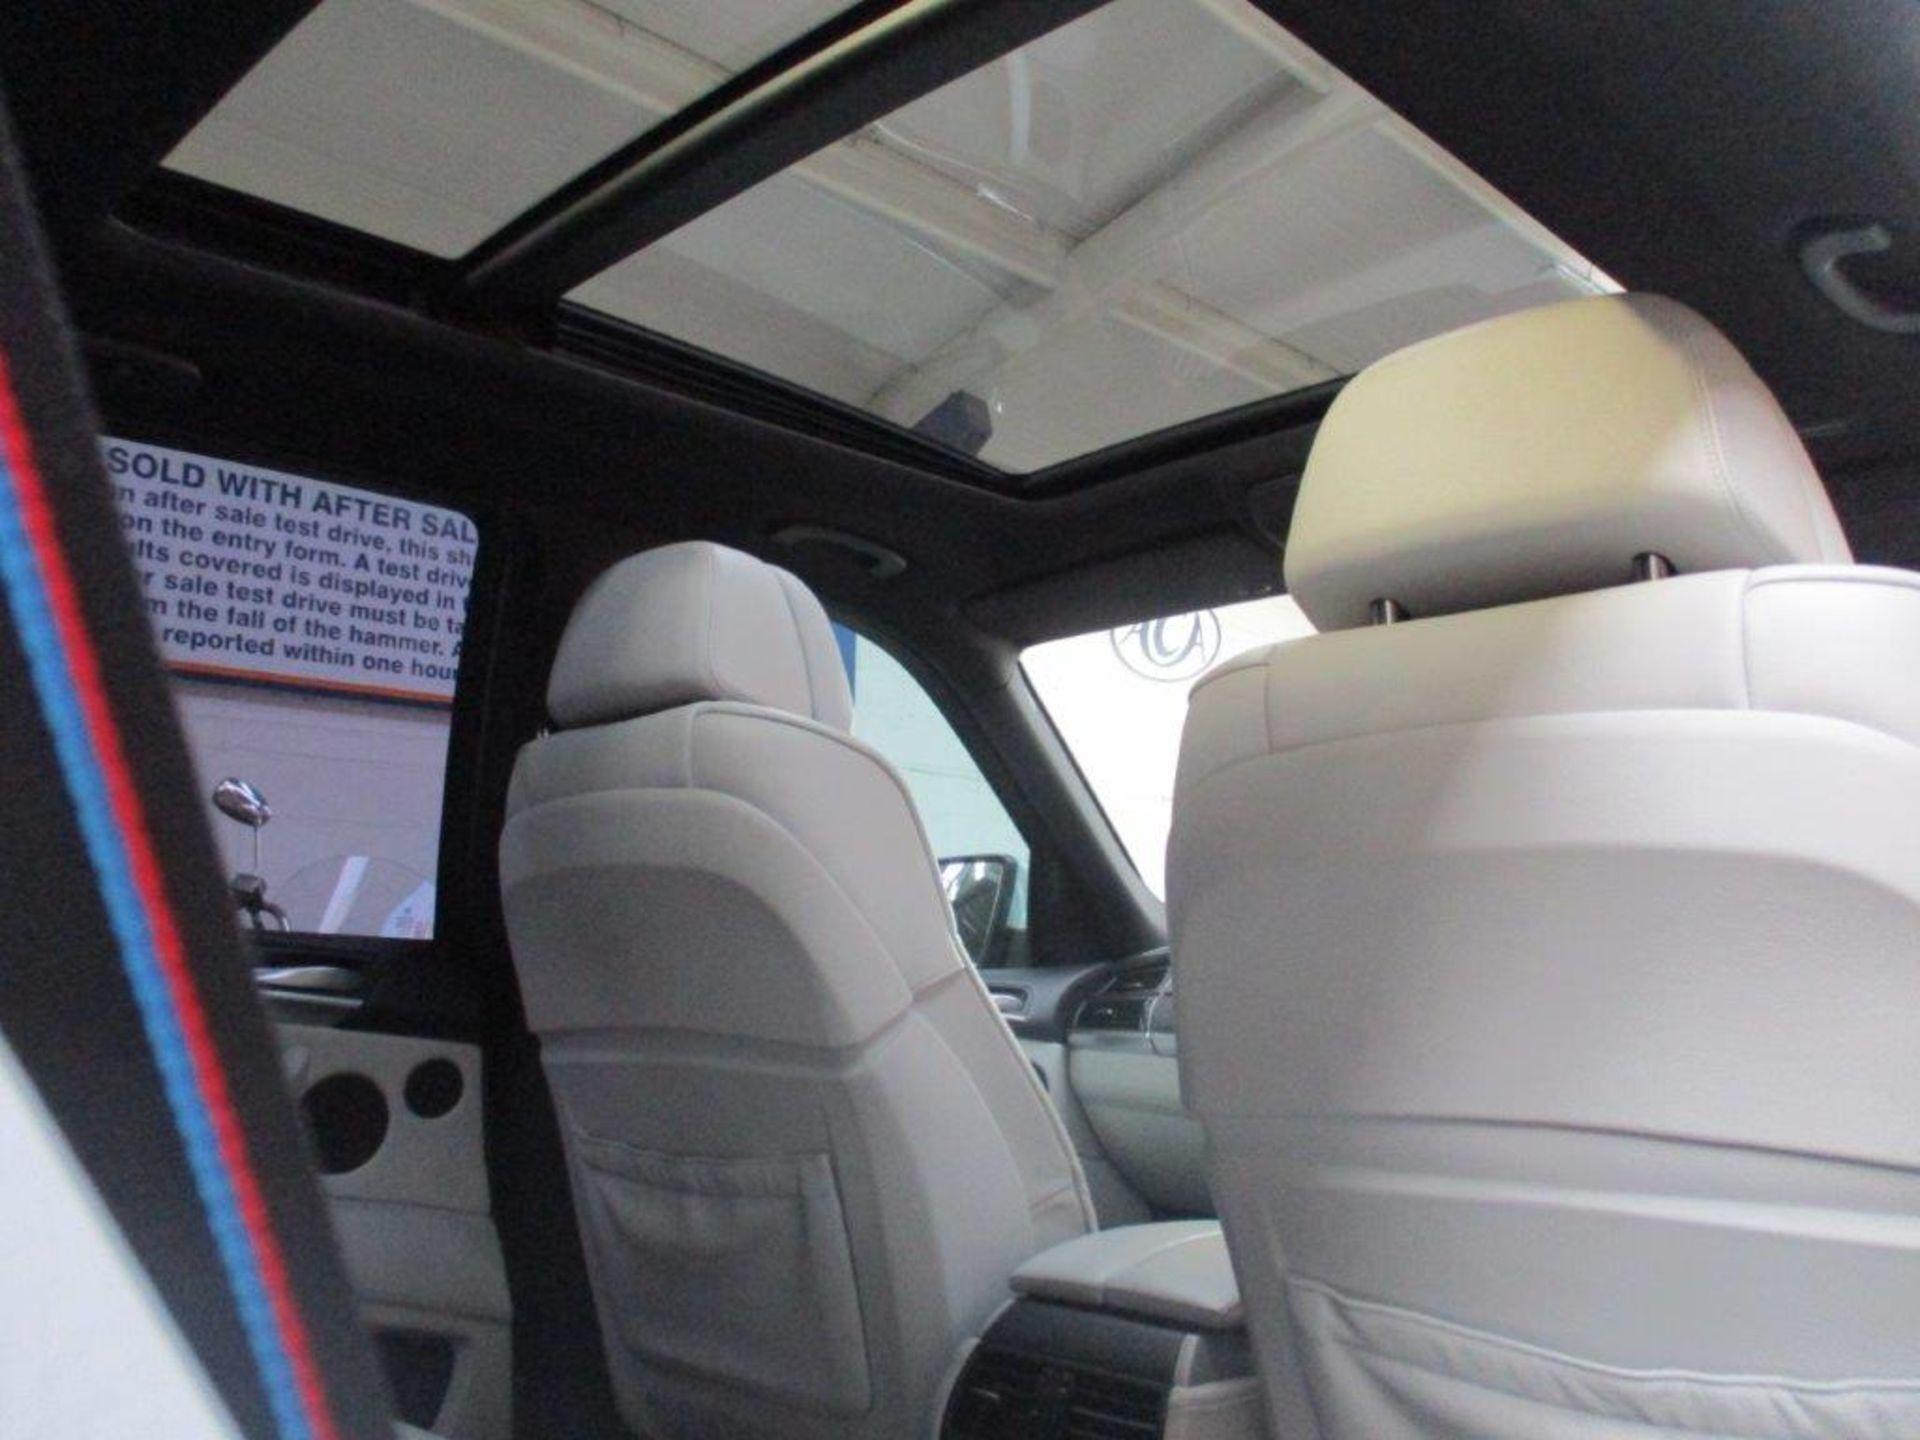 60 10 BMW X5 M Turbo Auto - Image 20 of 35